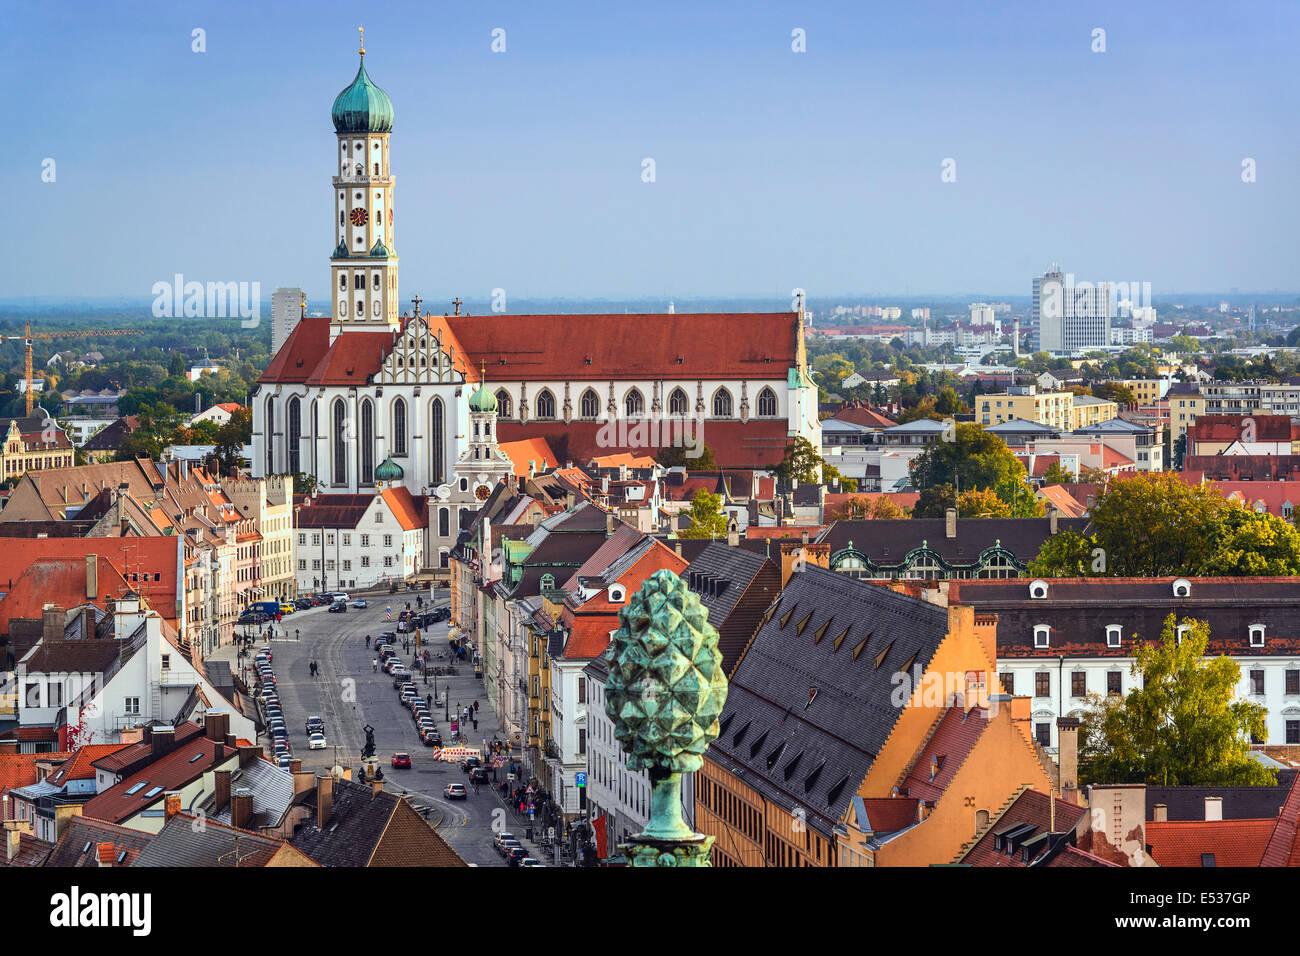 Augsburg, Germany downtown skyline. - Stock Image